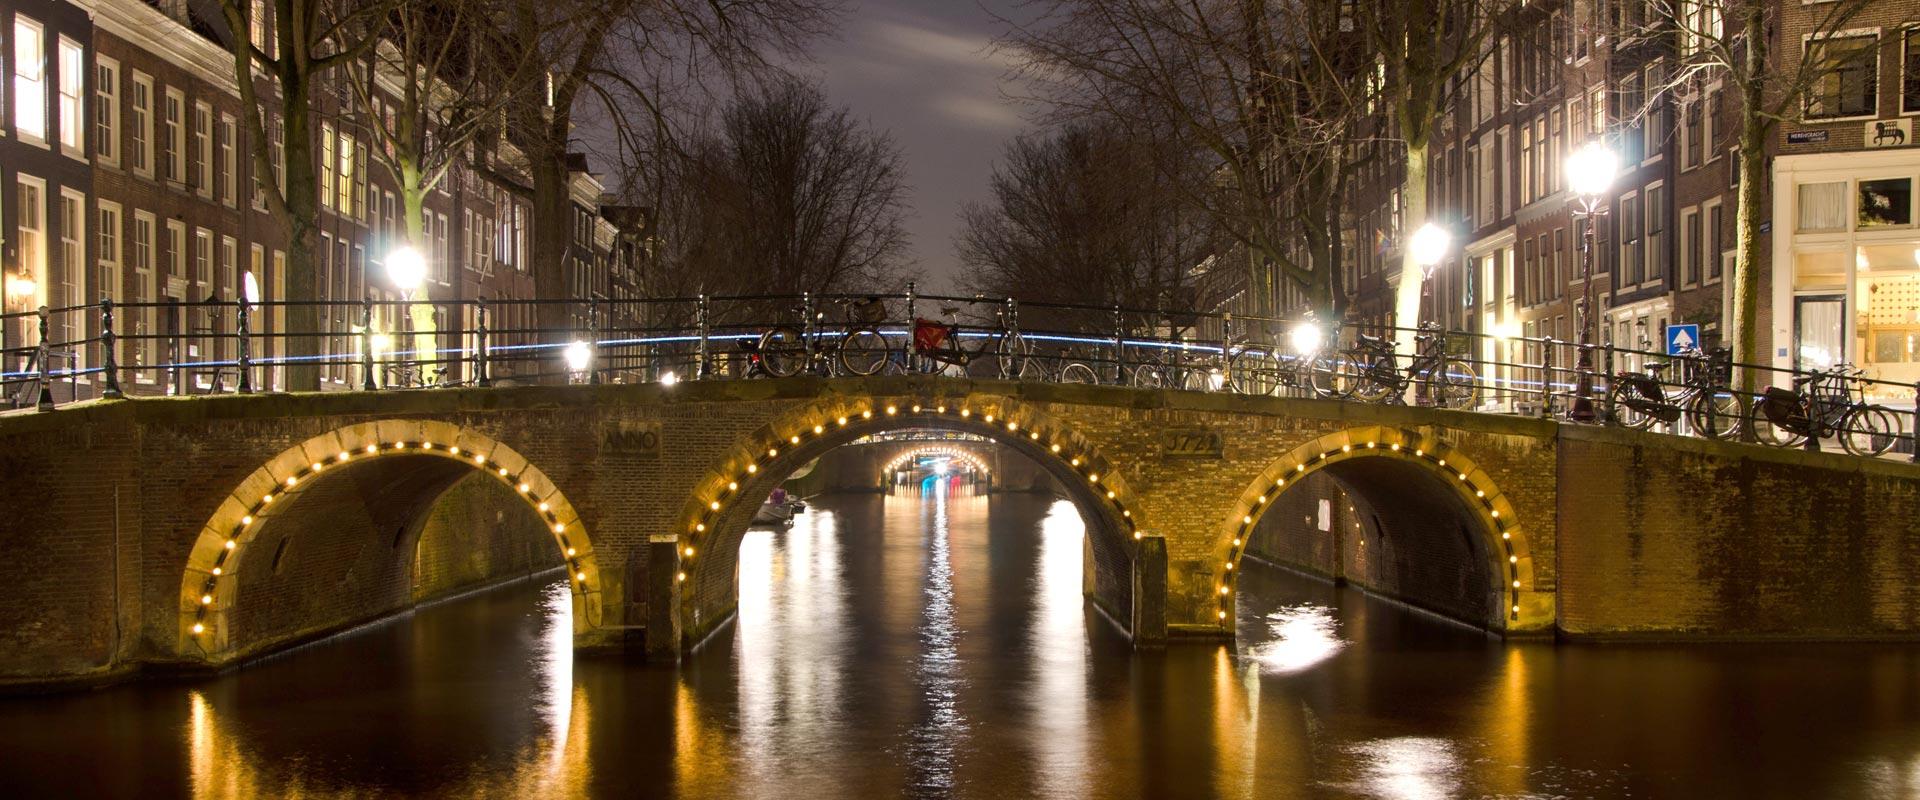 amsterdam-voyage-europe-via-nostra